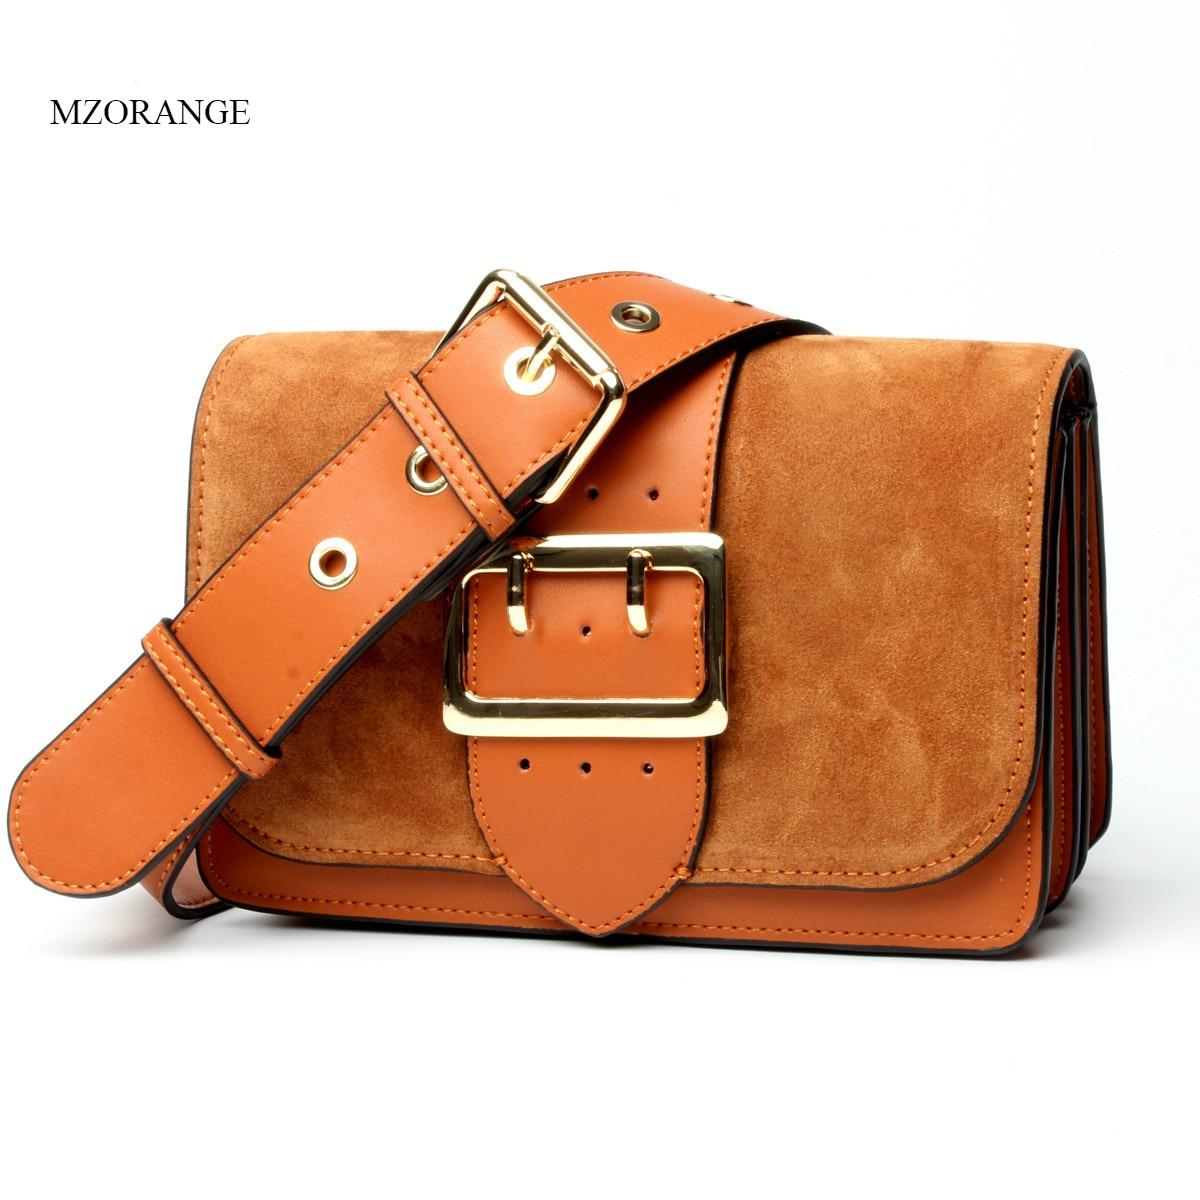 MZORANGE Women Genuine Leather Shoulder Bags Fashion Scrub Small Handbags Wide Belt Organ Design Ladies Mini Crossbody Bags